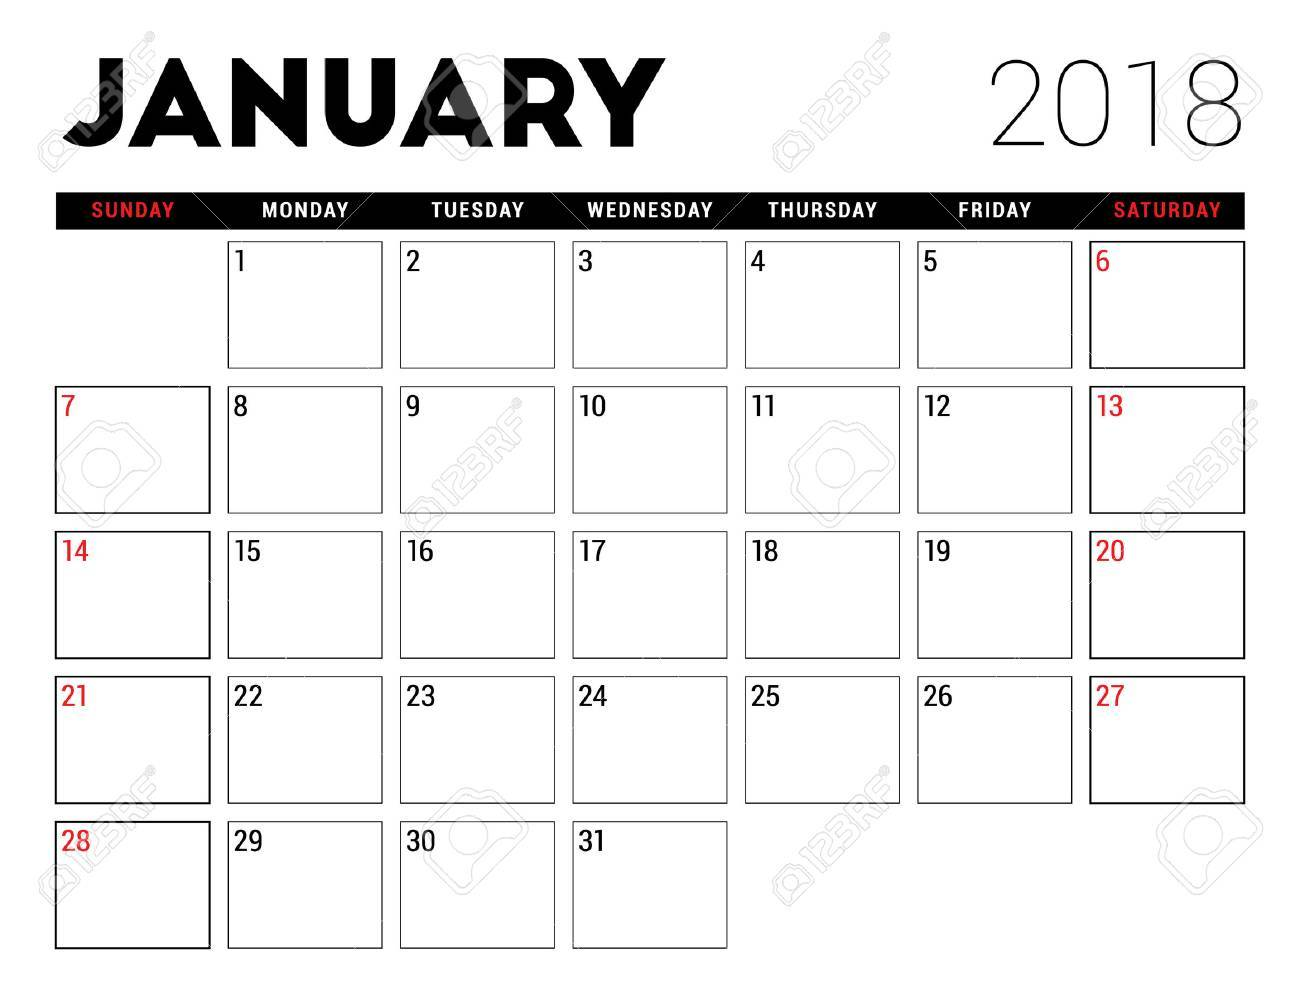 january 2018 free calendar